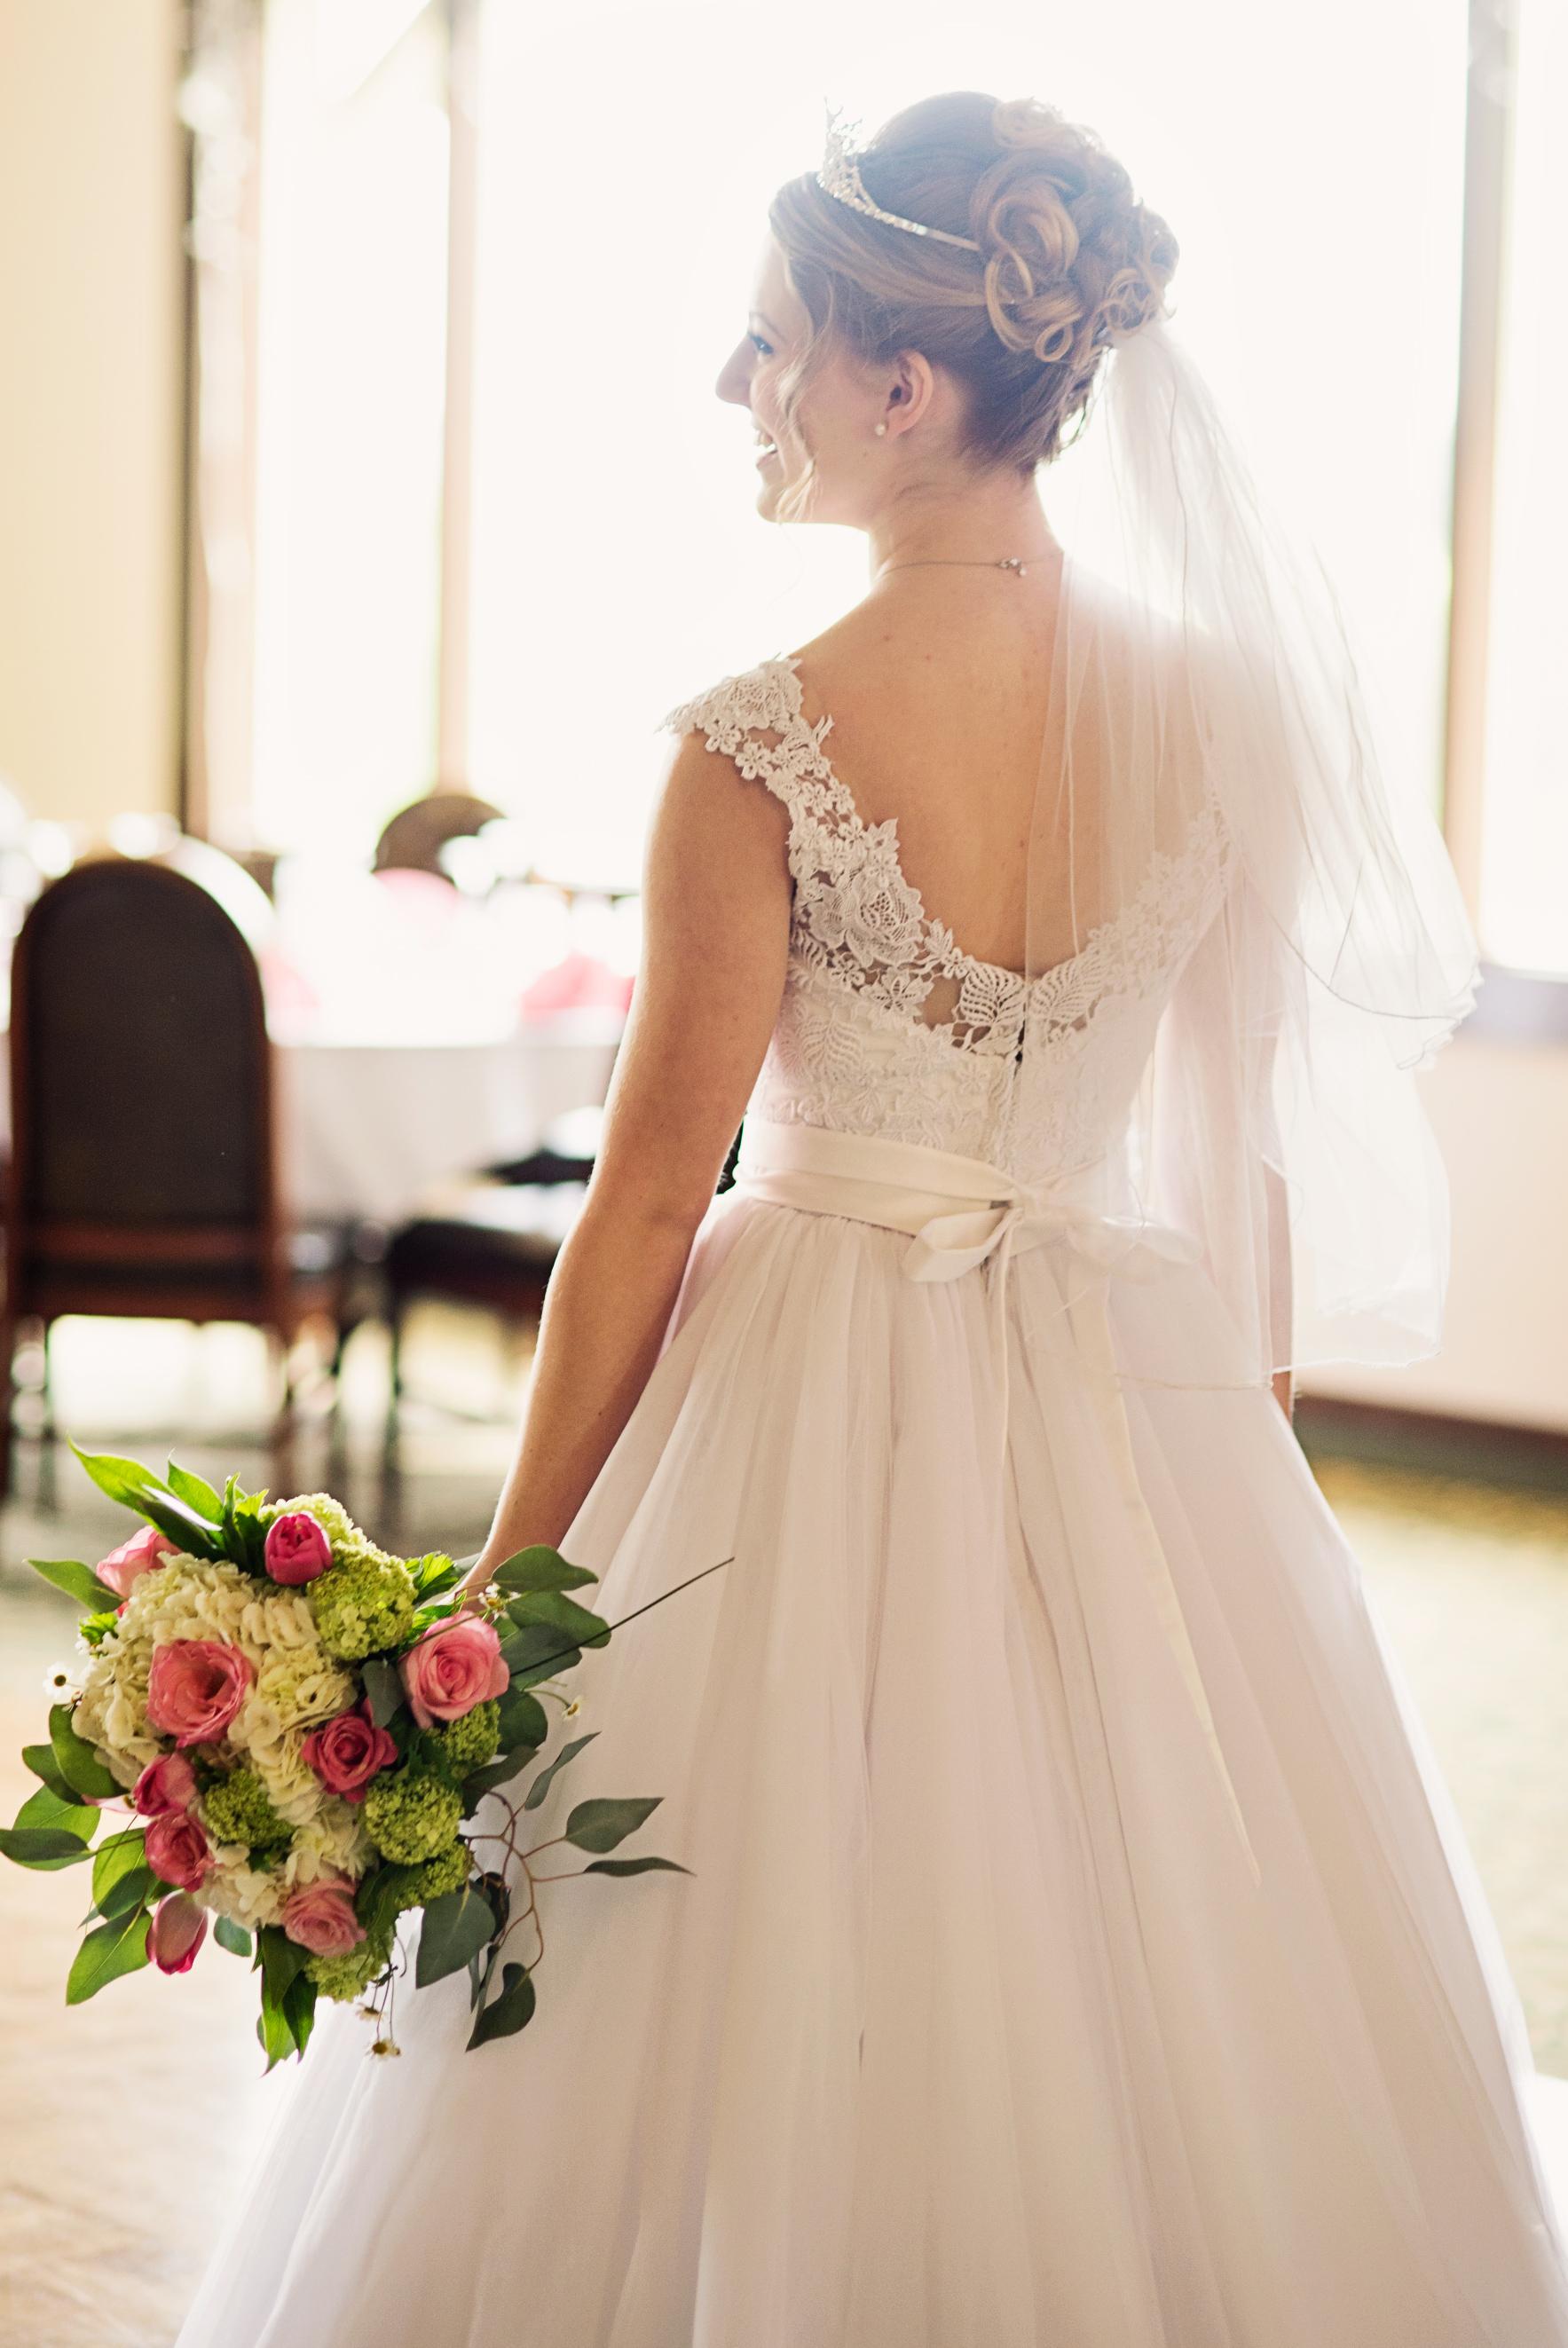 Fairytale Wedding_Seattle Wedding Photographer_Kelsey Lane Photography_9